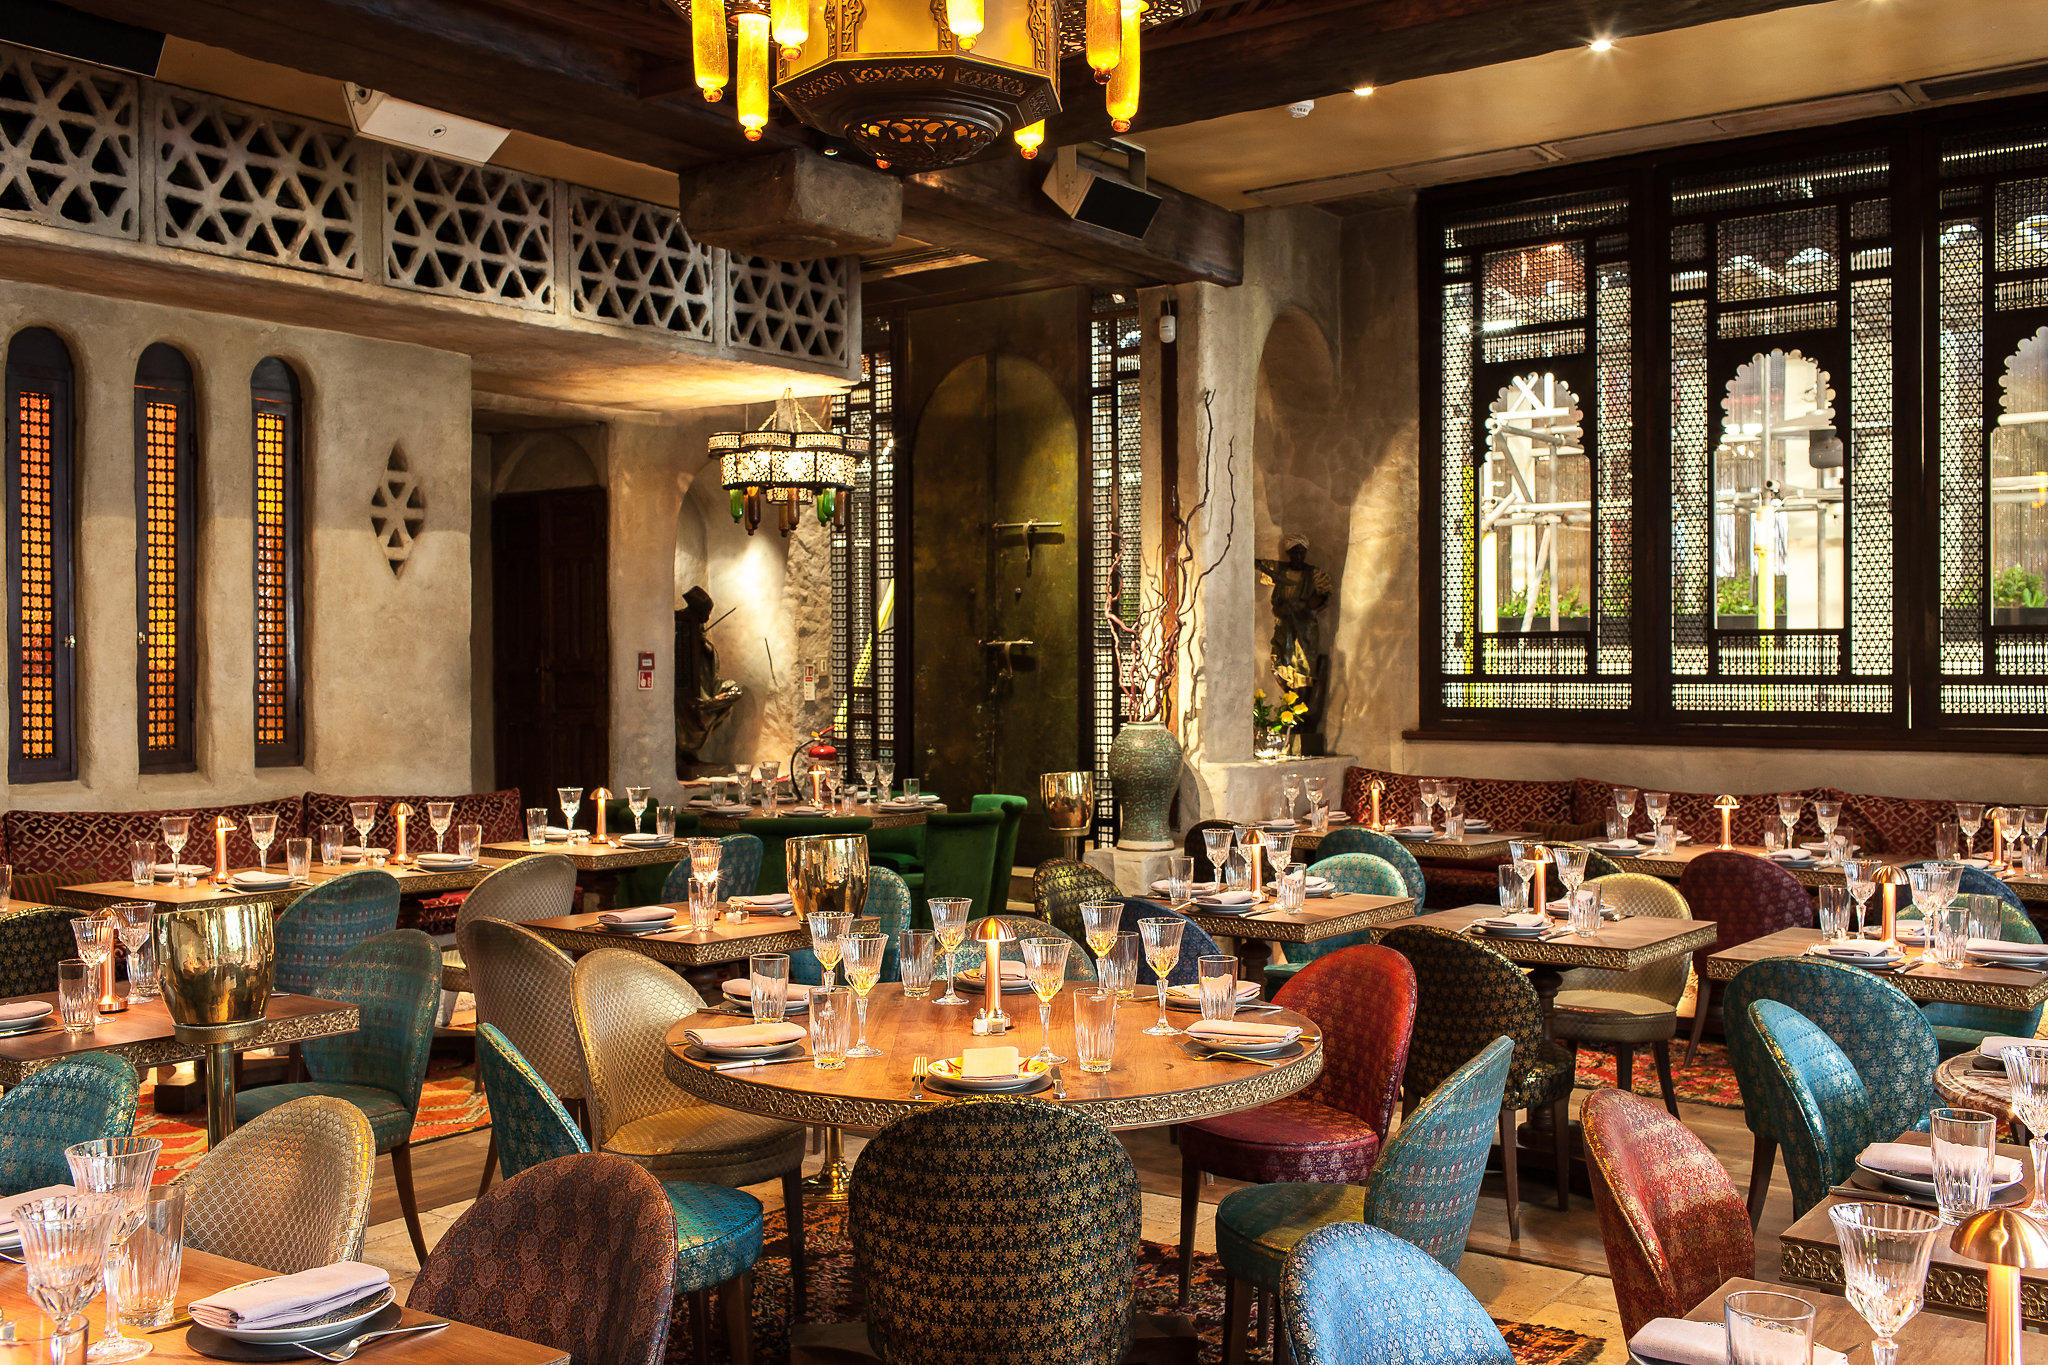 Momo restaurant review interiors, Mayfair London